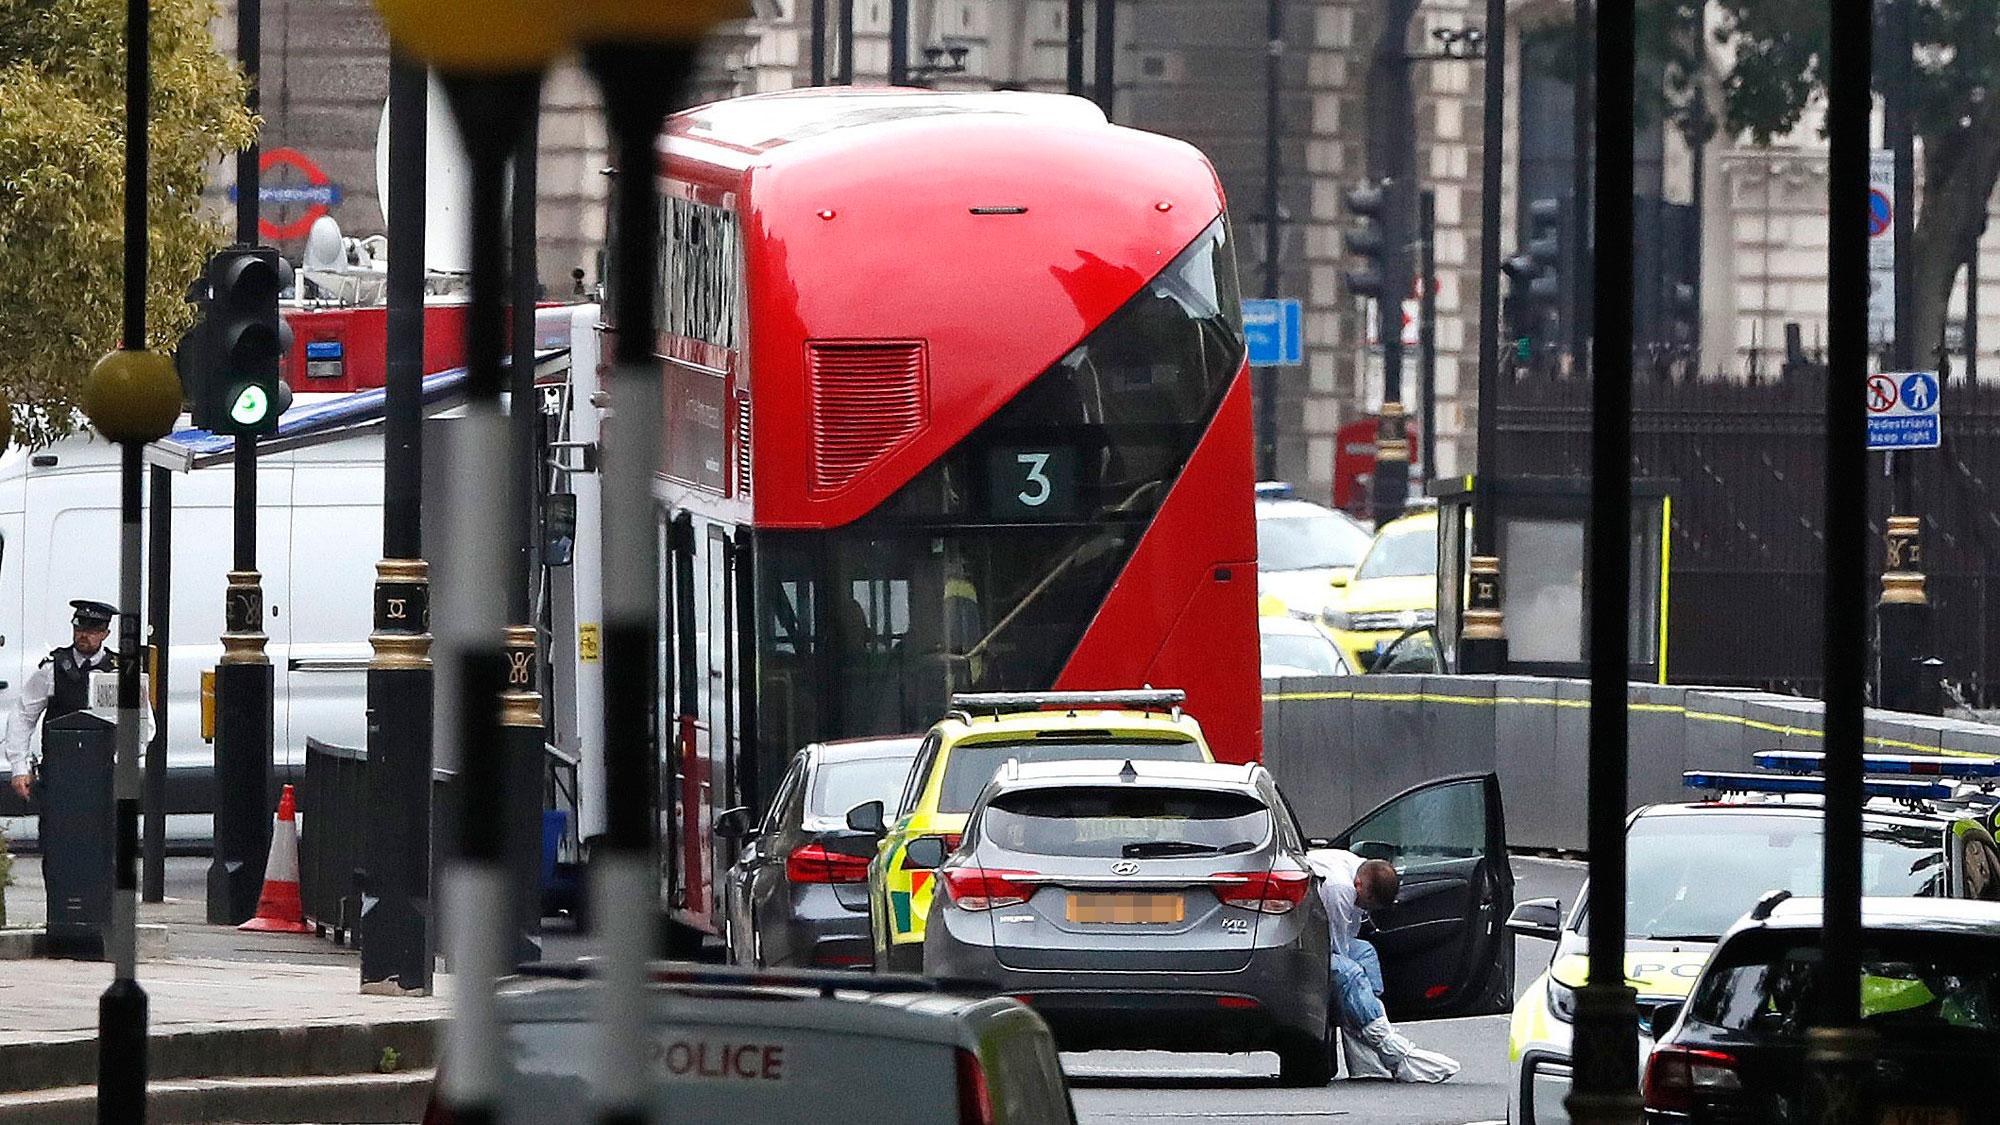 Man arrested over Westminster vehicle crash suspected of terror offences